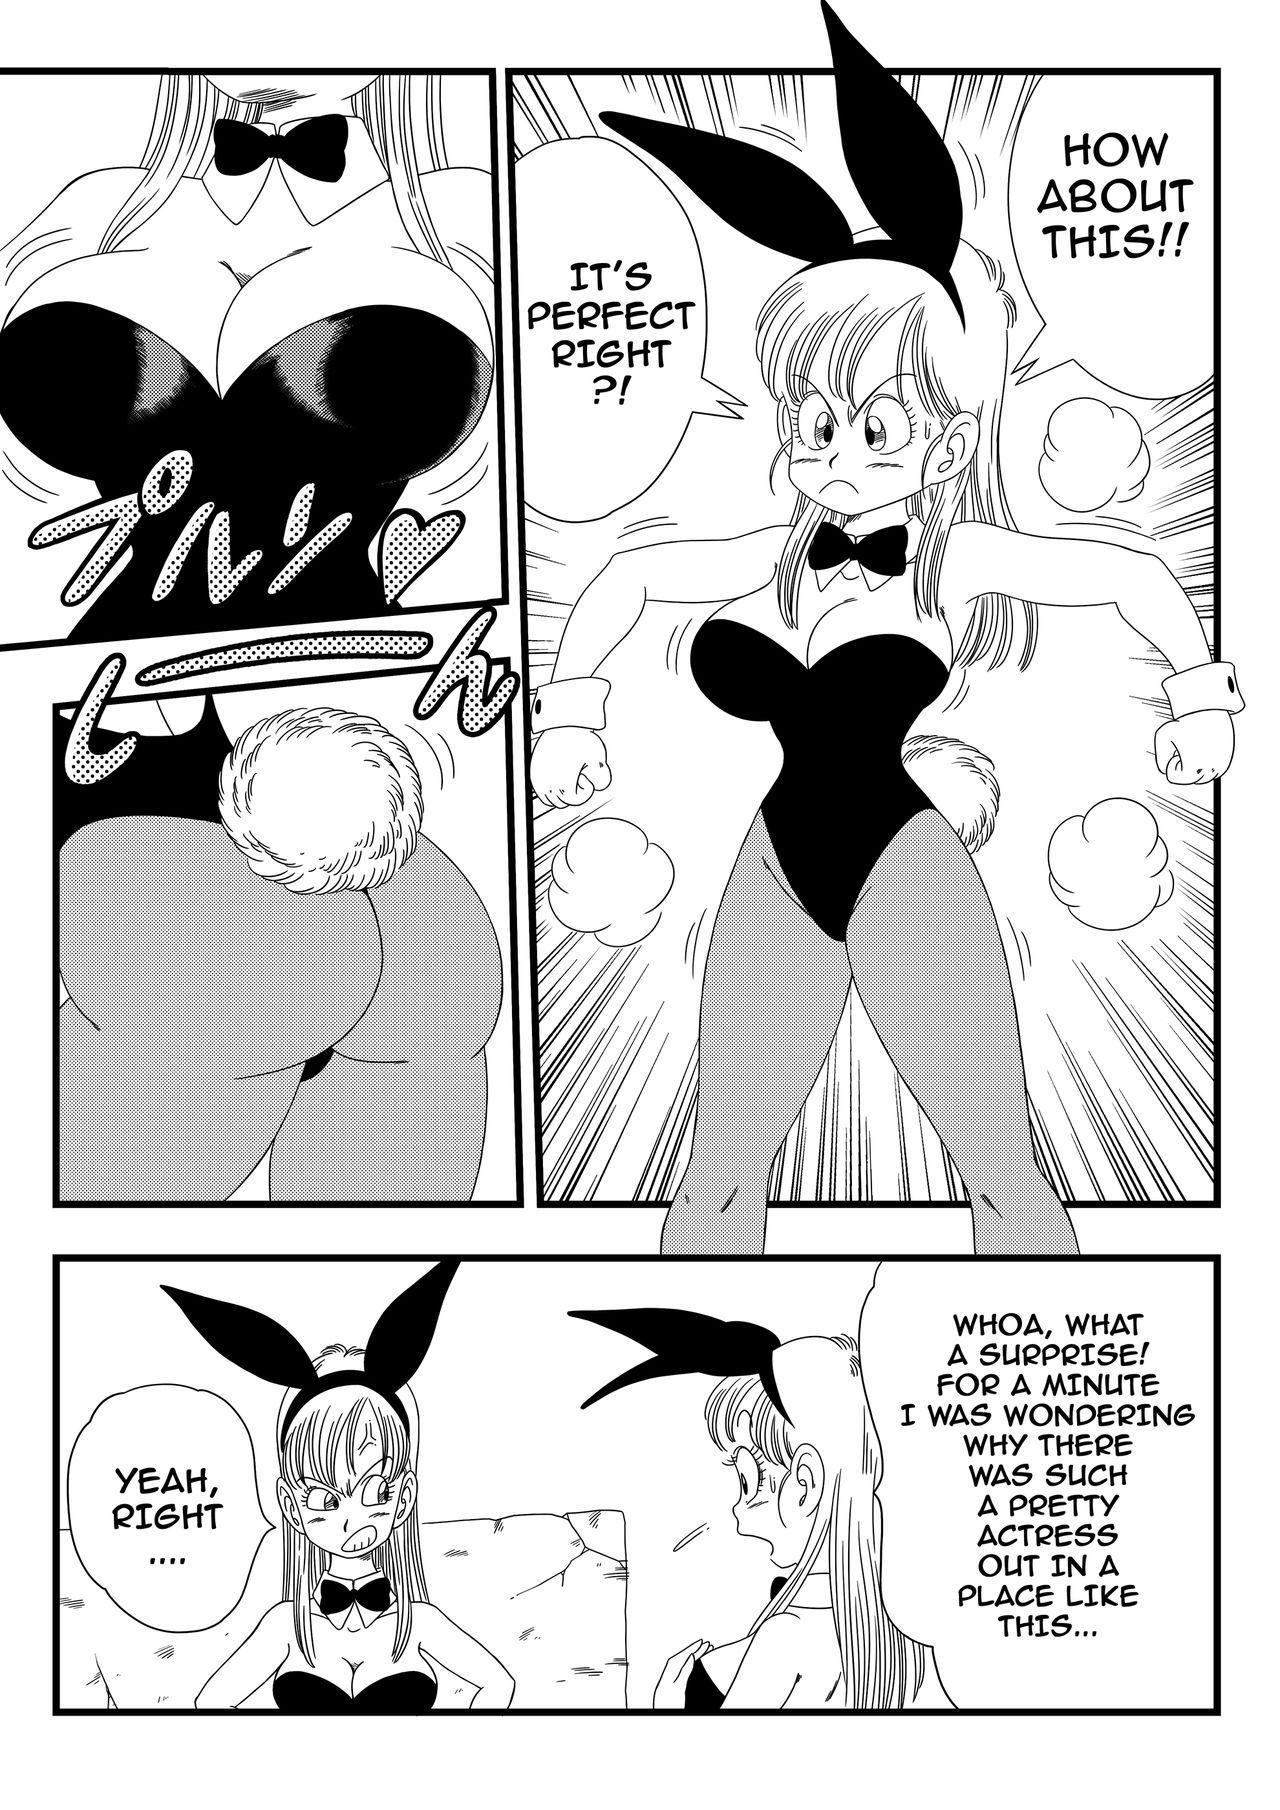 Bunny Girl Transformation 4